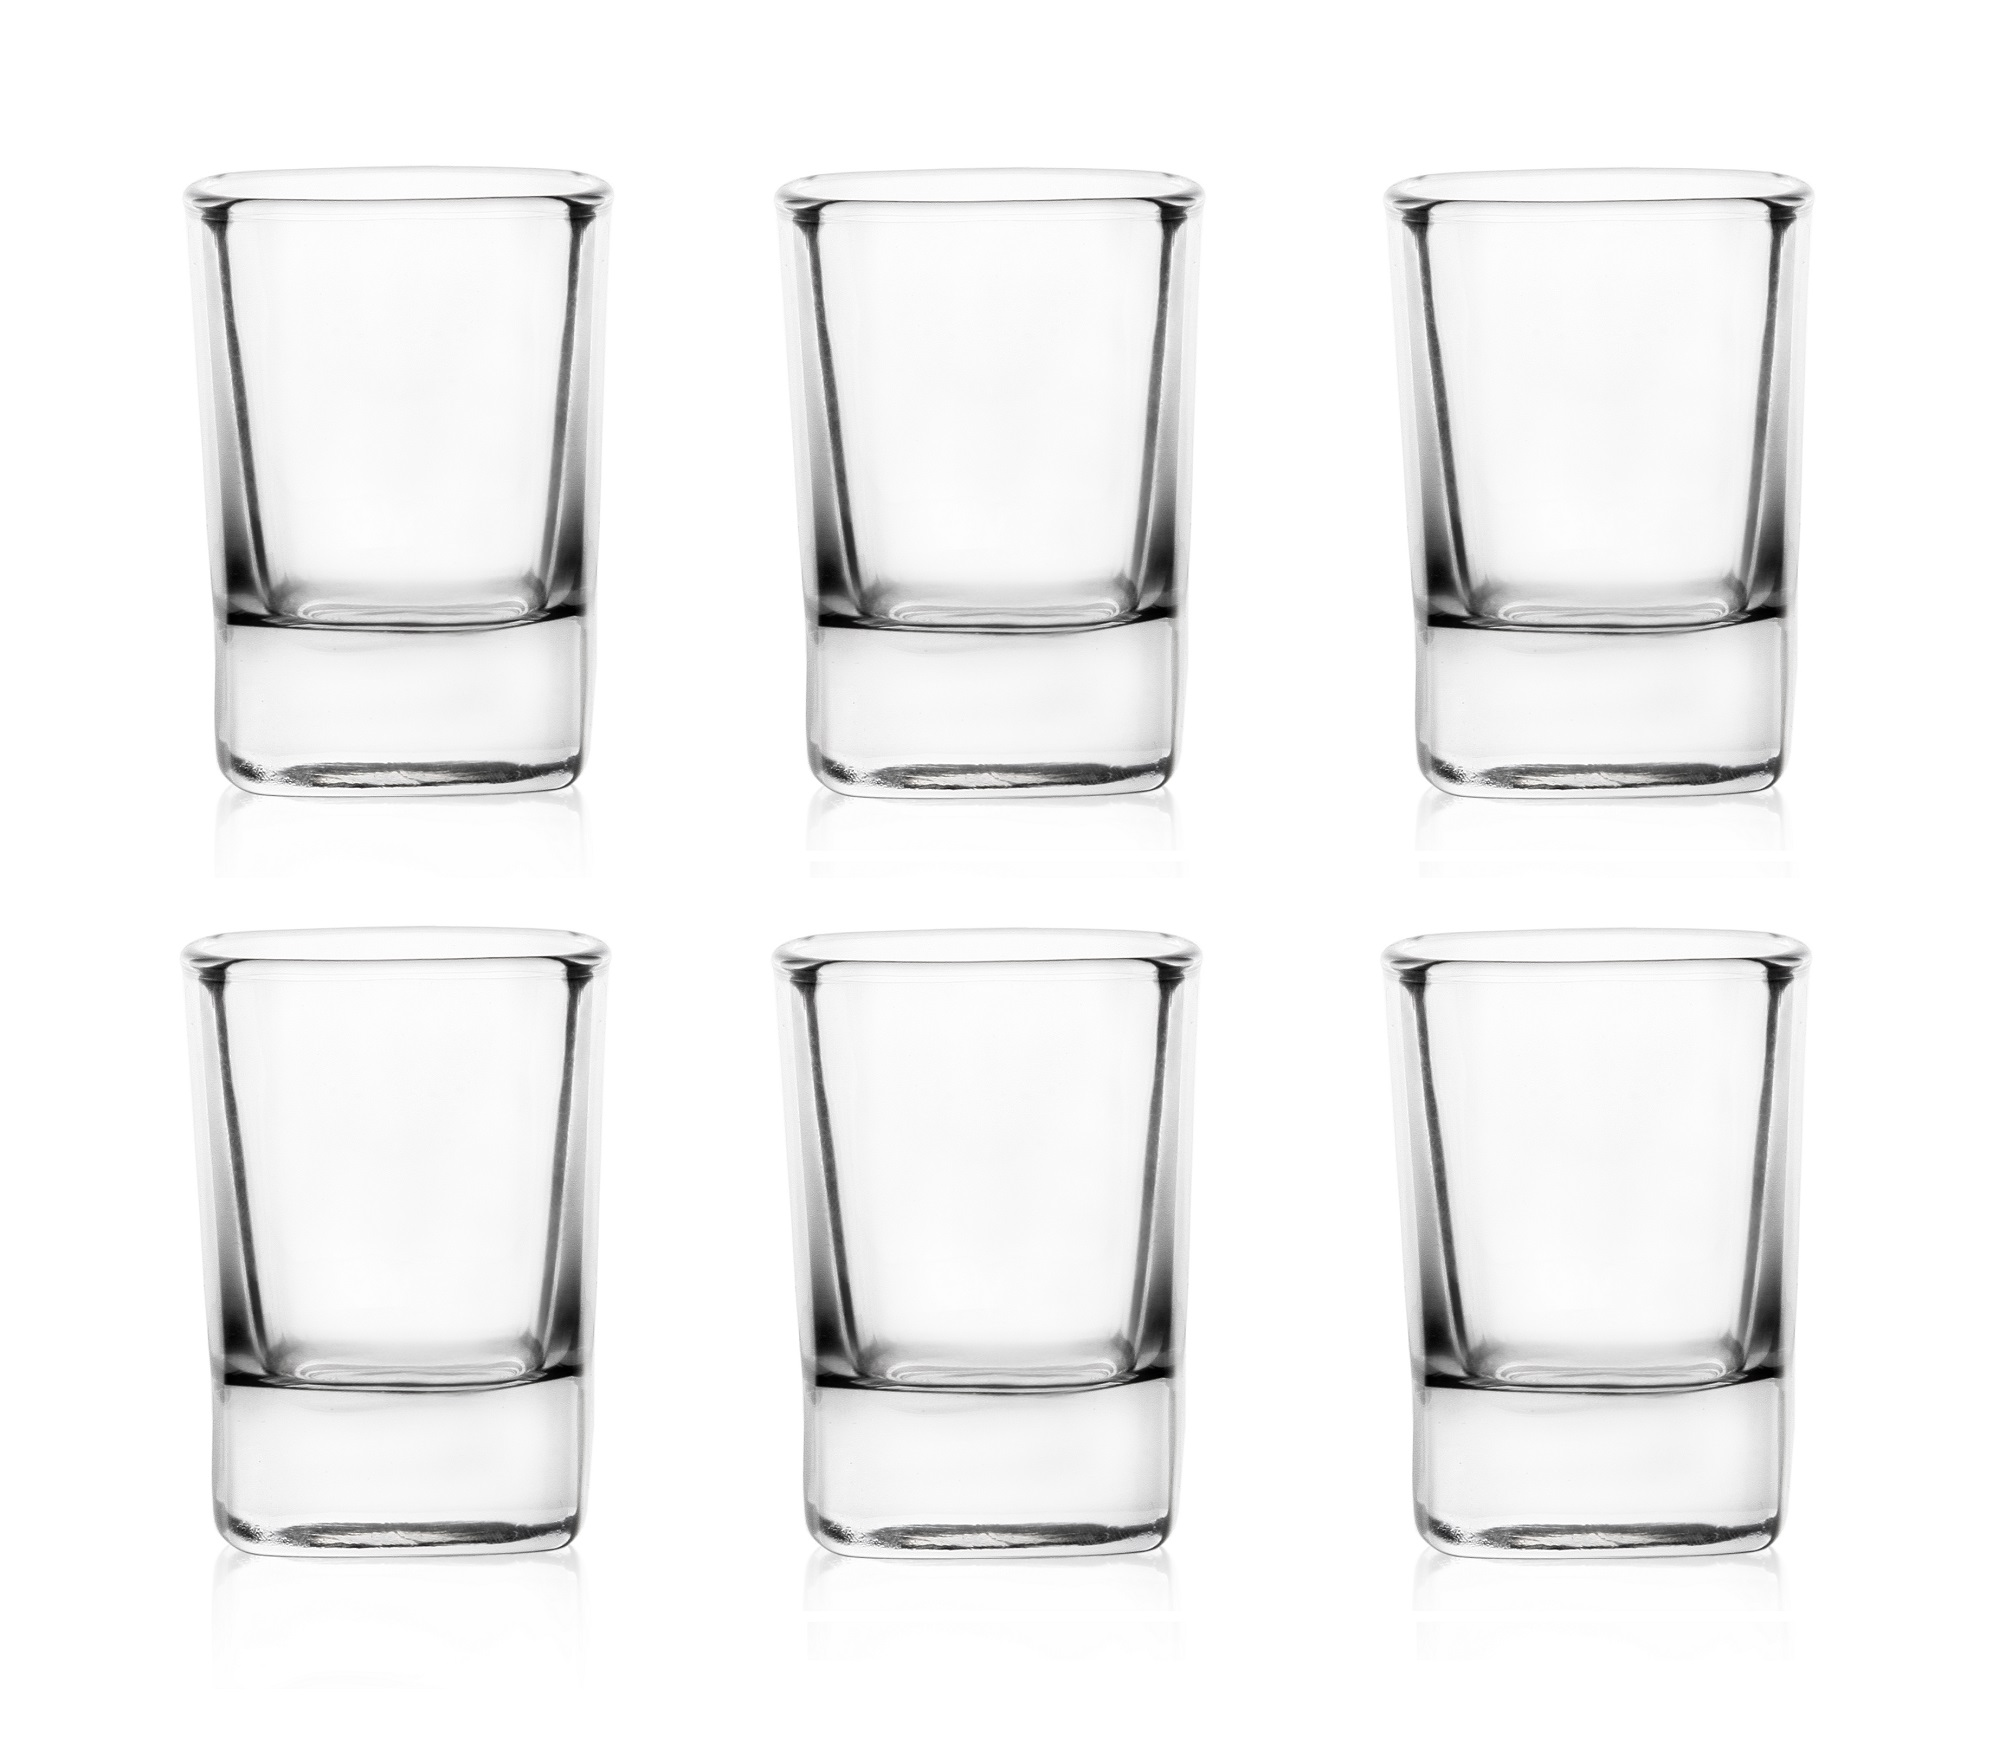 Sada 6 panáků na alkohol - 50ml